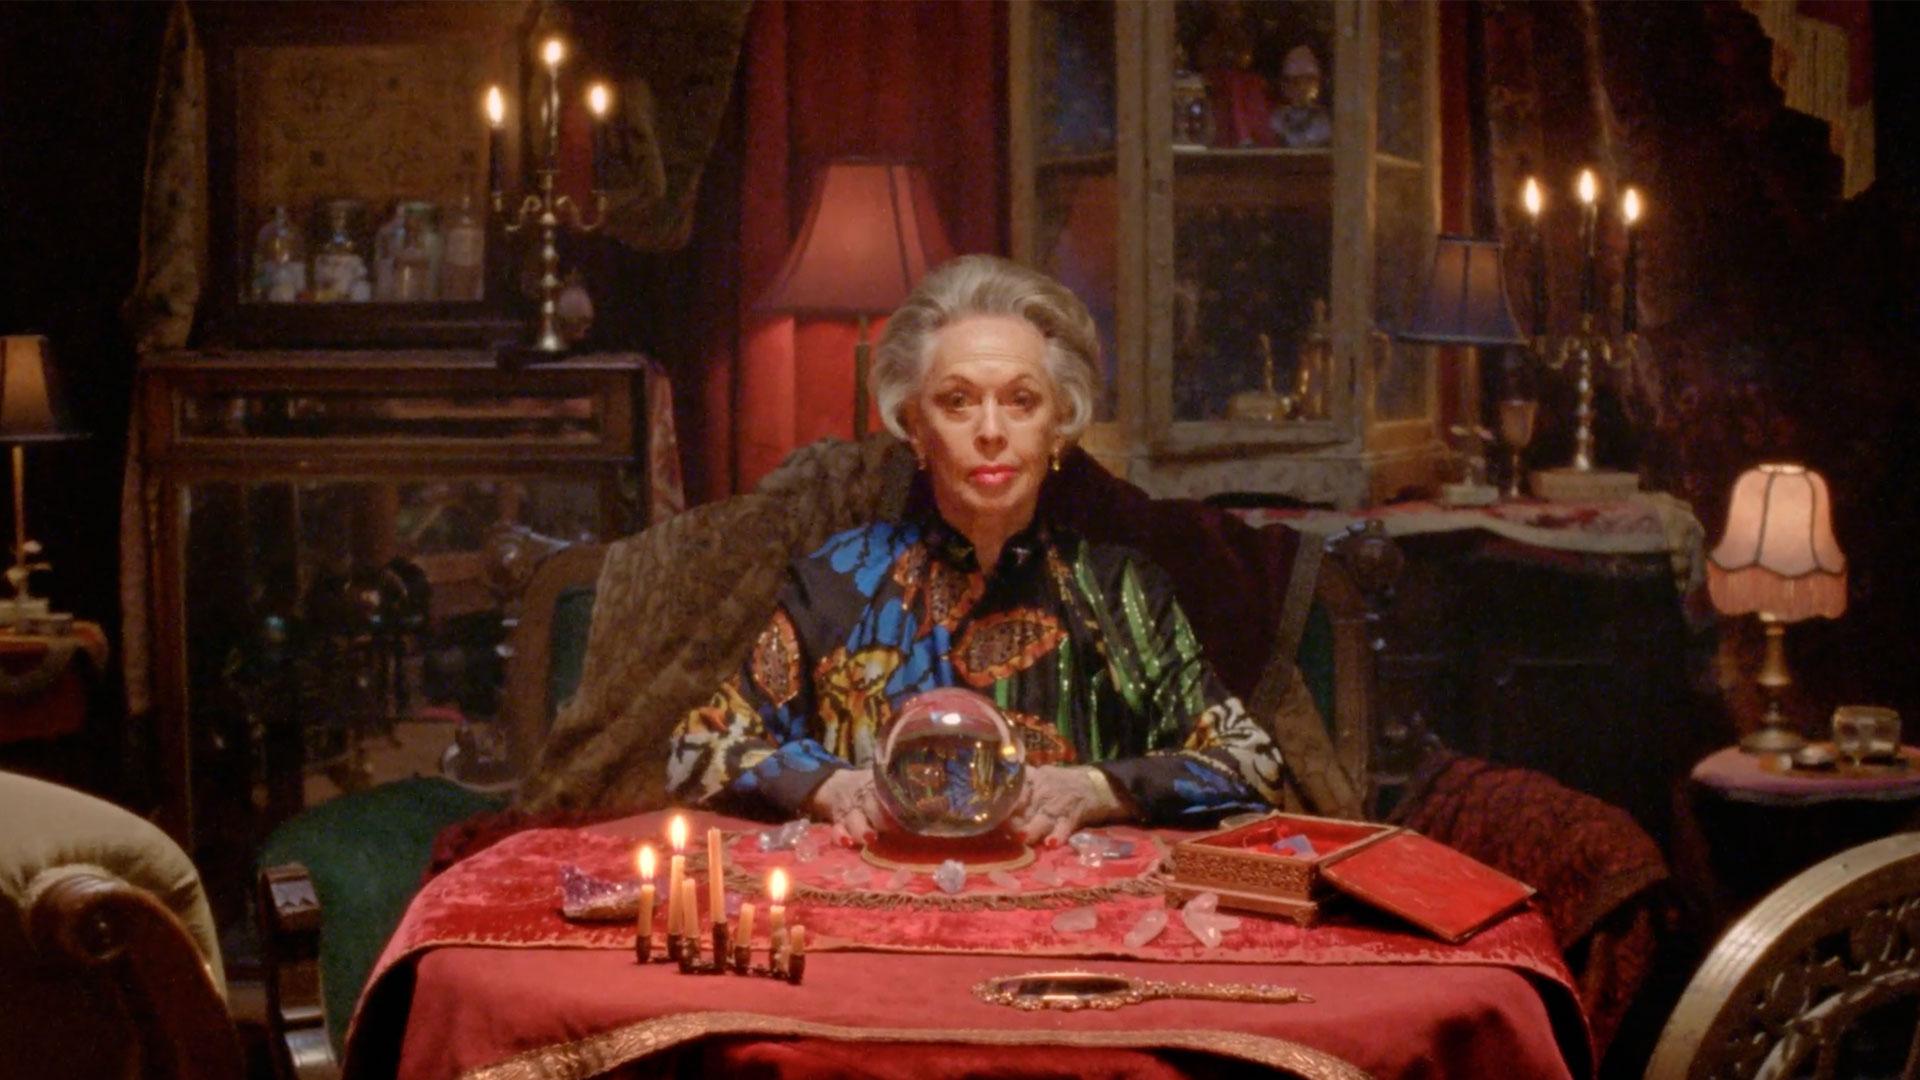 Tippi Hedren Es La Nueva Imagen de Gucci en: The Fortune Teller